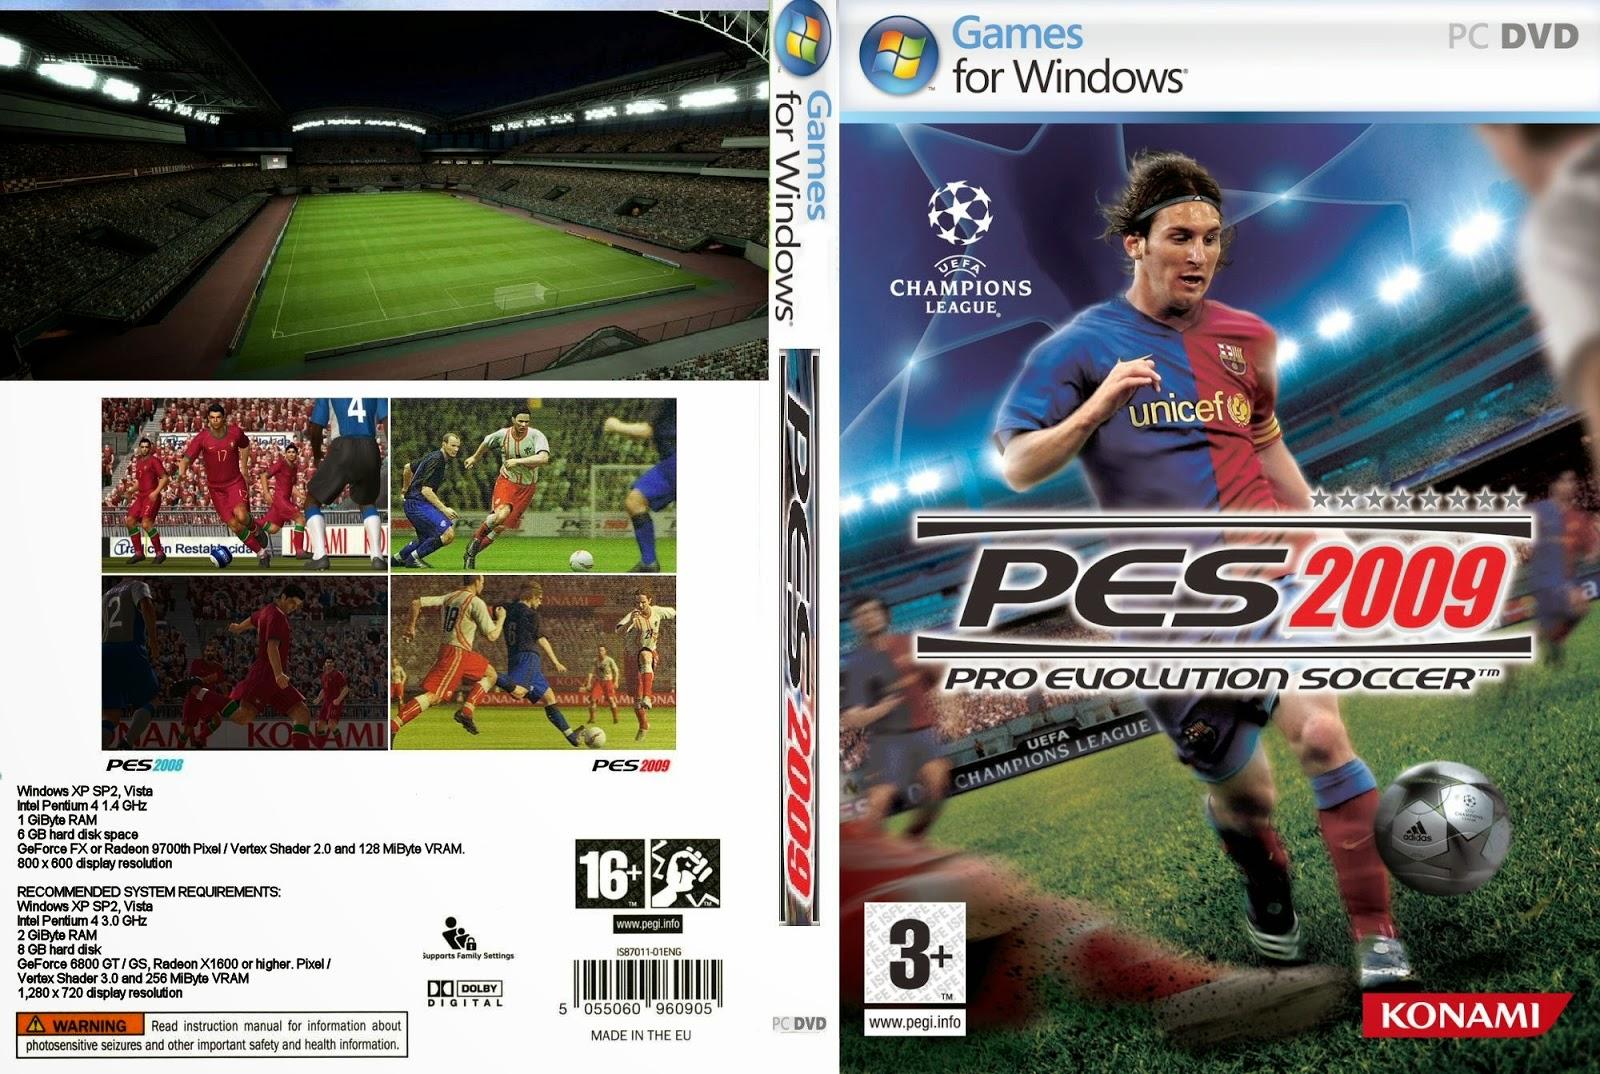 تحميل لعبة PES 2009 برابط واحد مباشر وبدون تثبيت